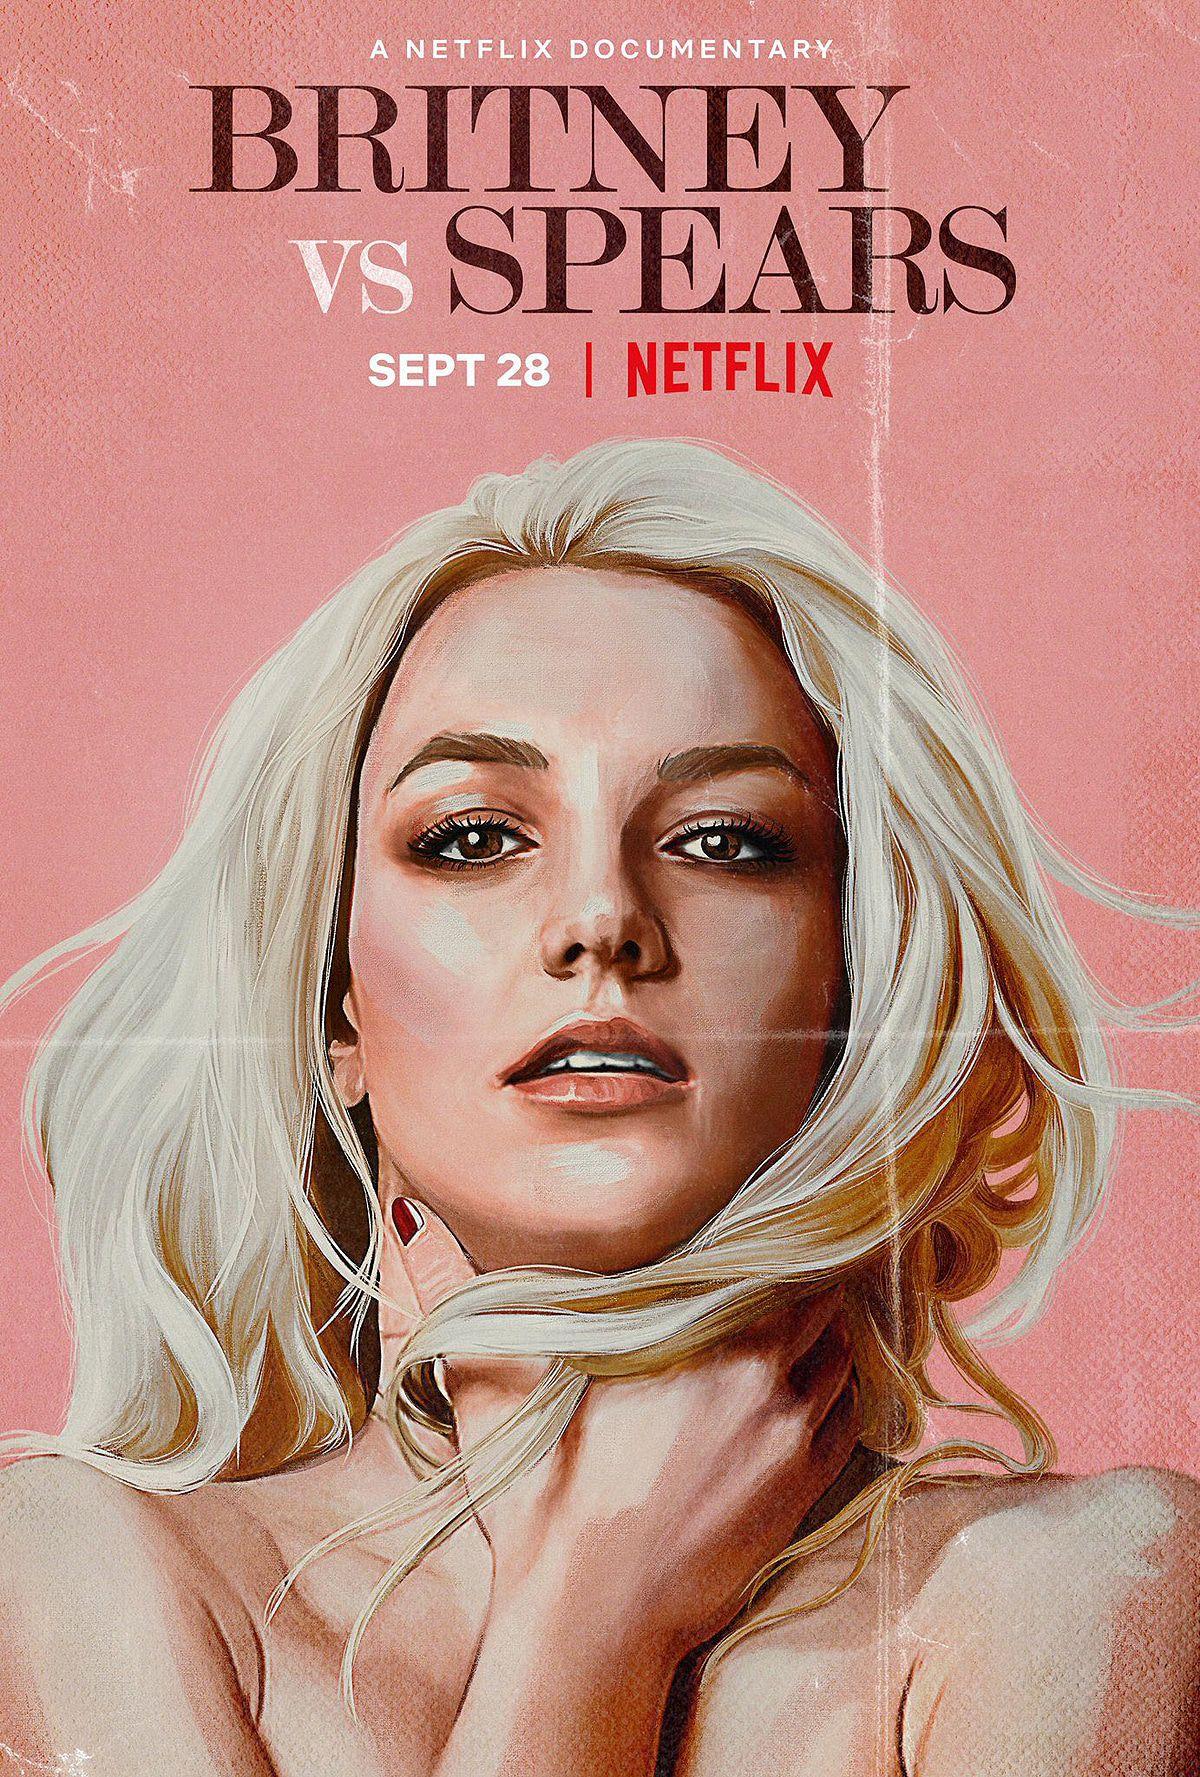 """Britney vs Spears"" - Trailer zu neuer Netflix-Doku"